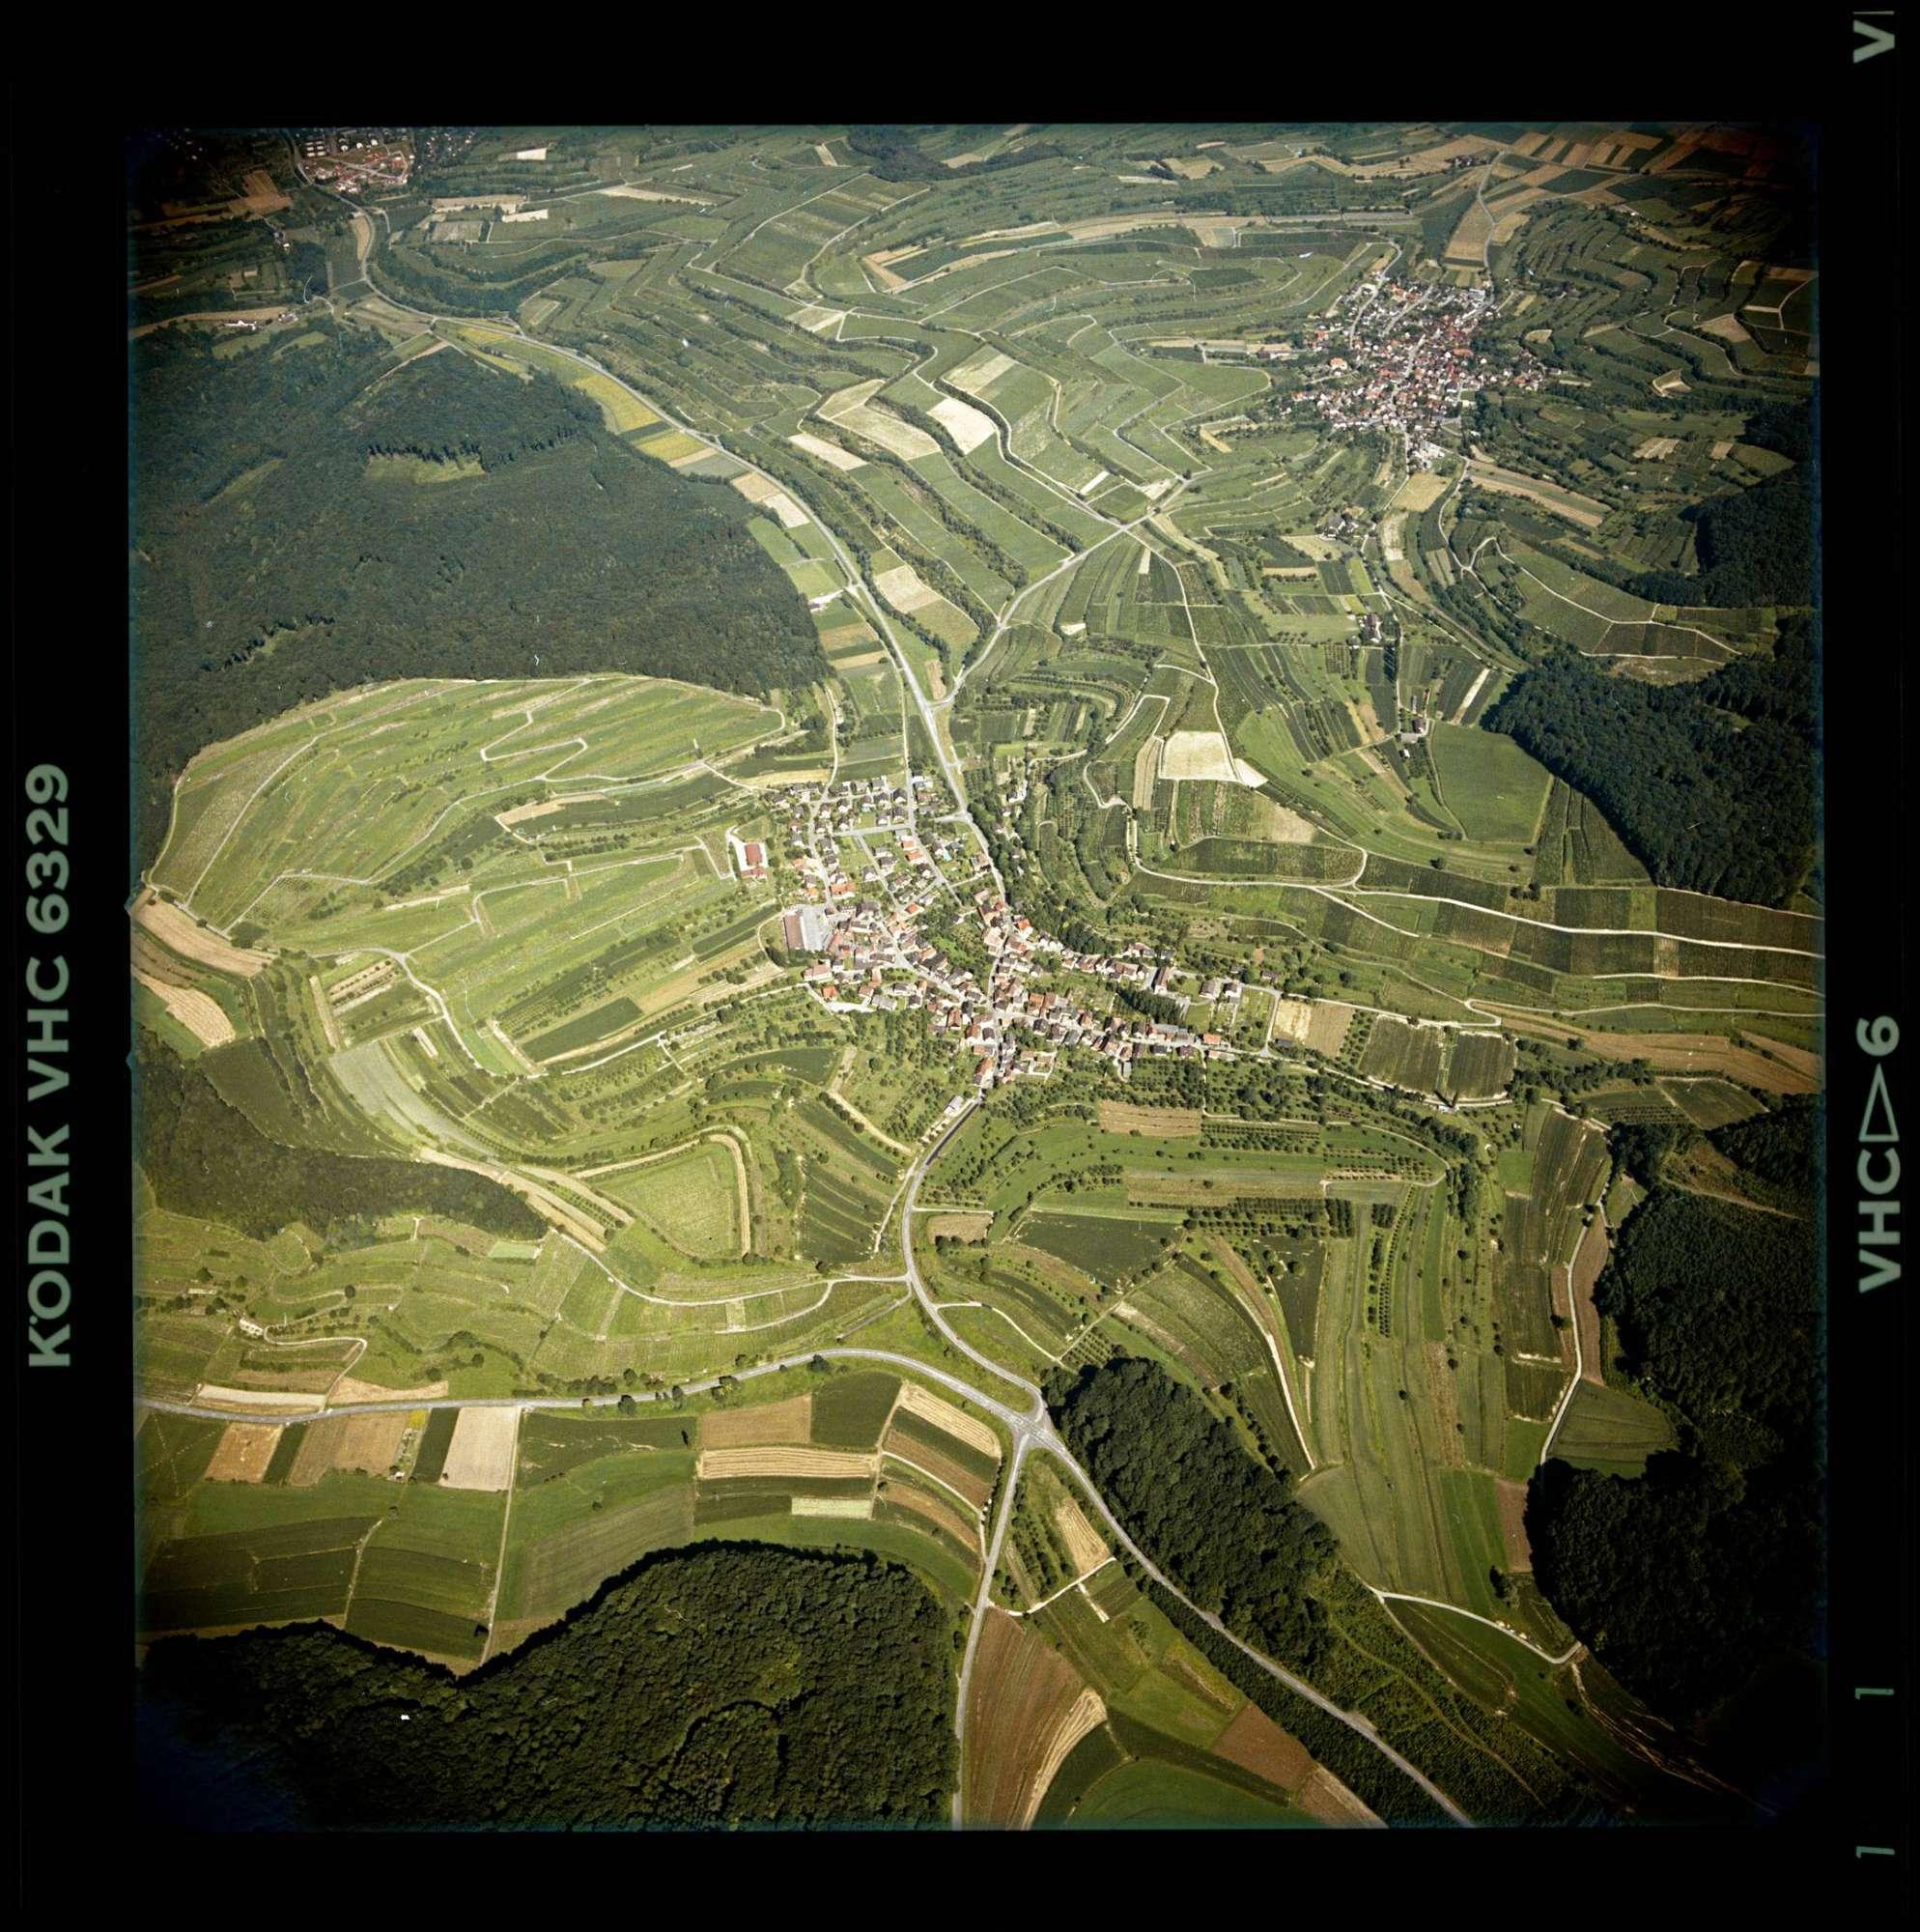 Bombach, Luftbild, Bild 1